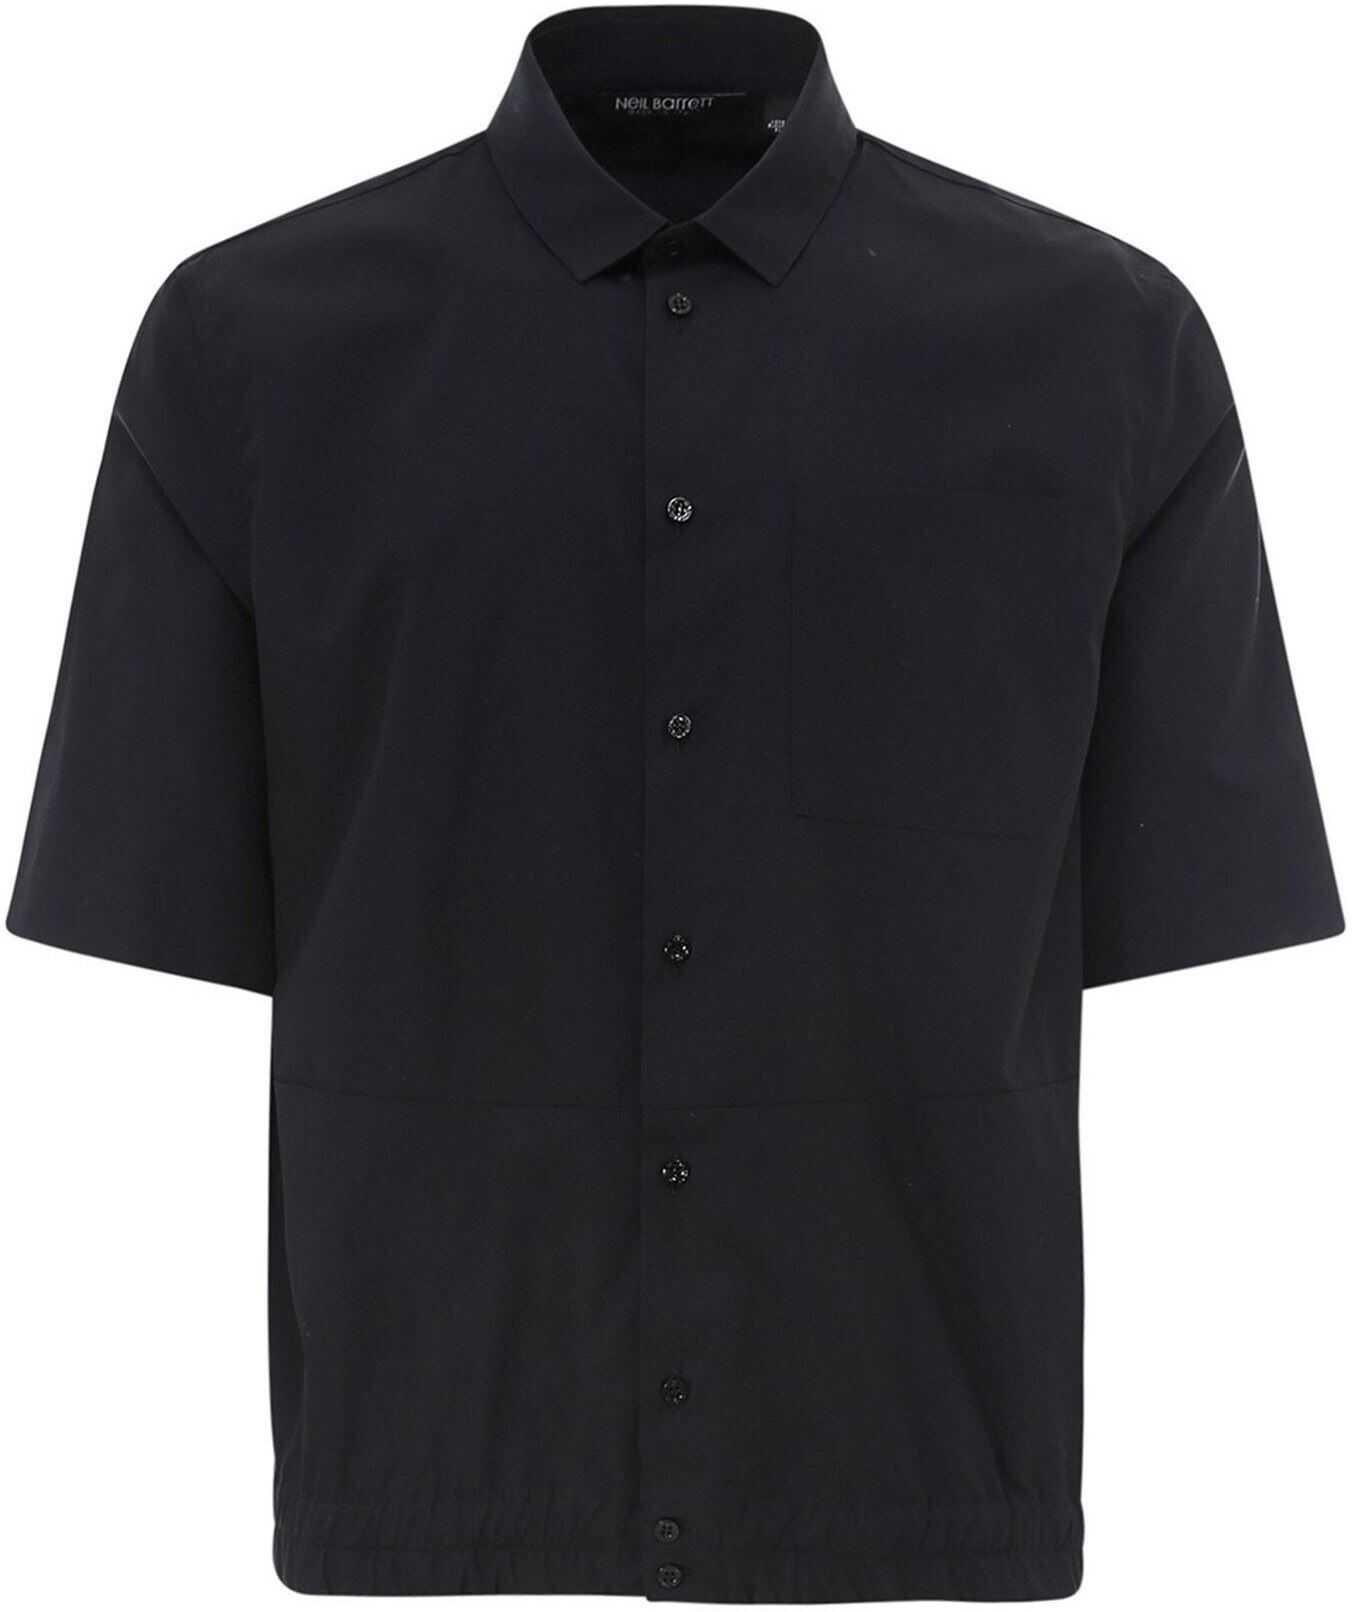 Neil Barrett Cotton Shirt Black imagine